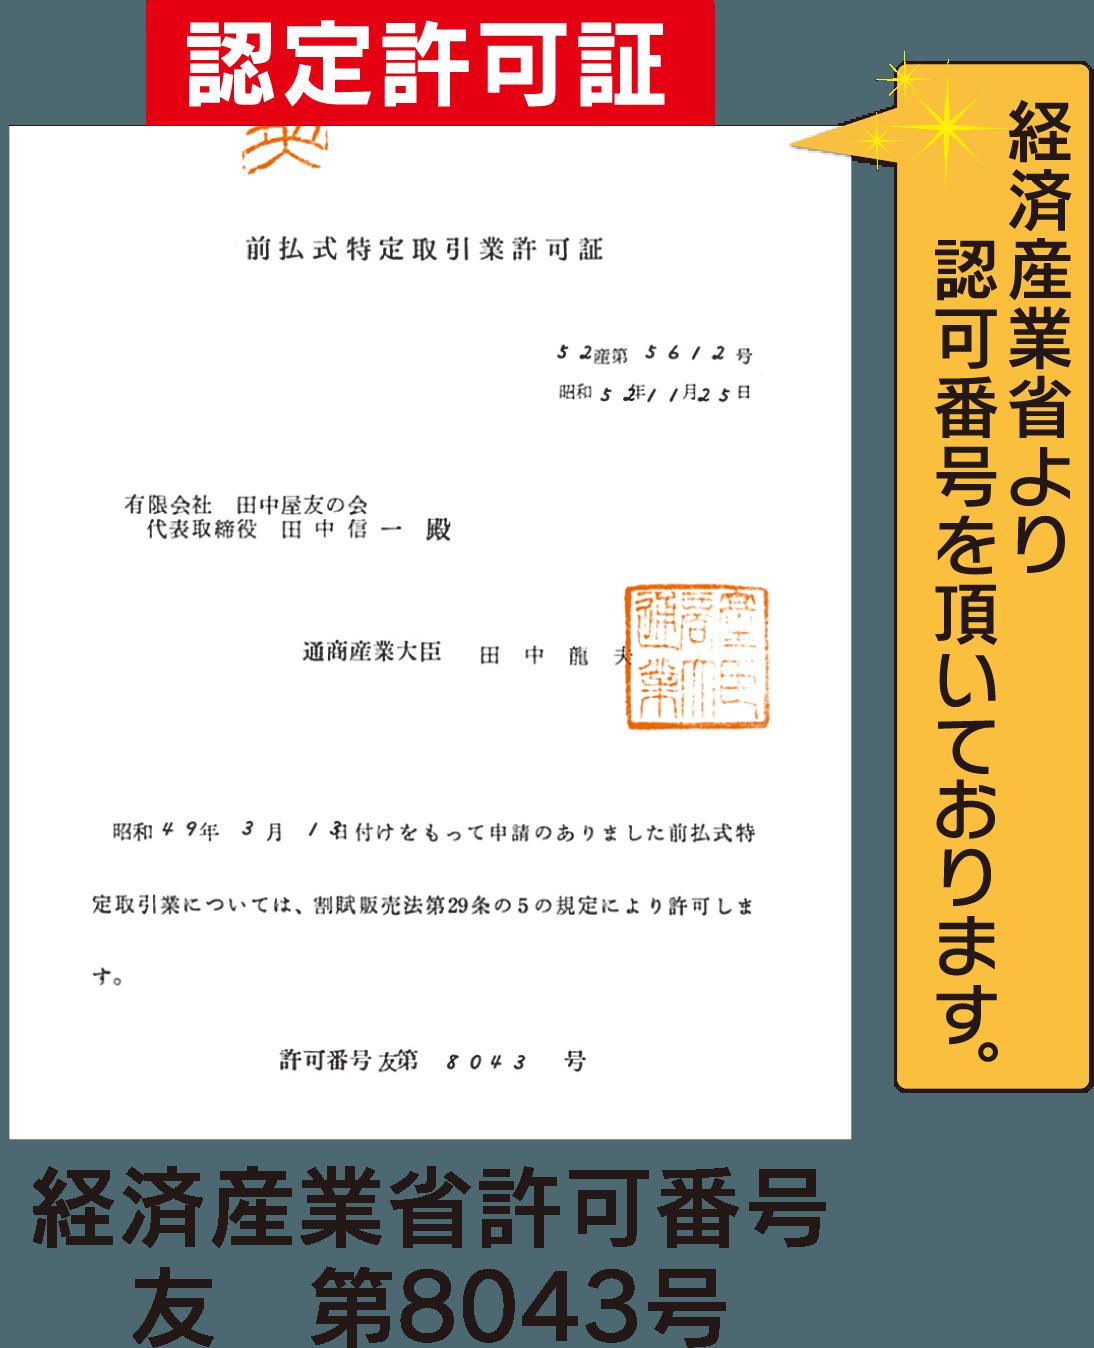 認定許可証の写真